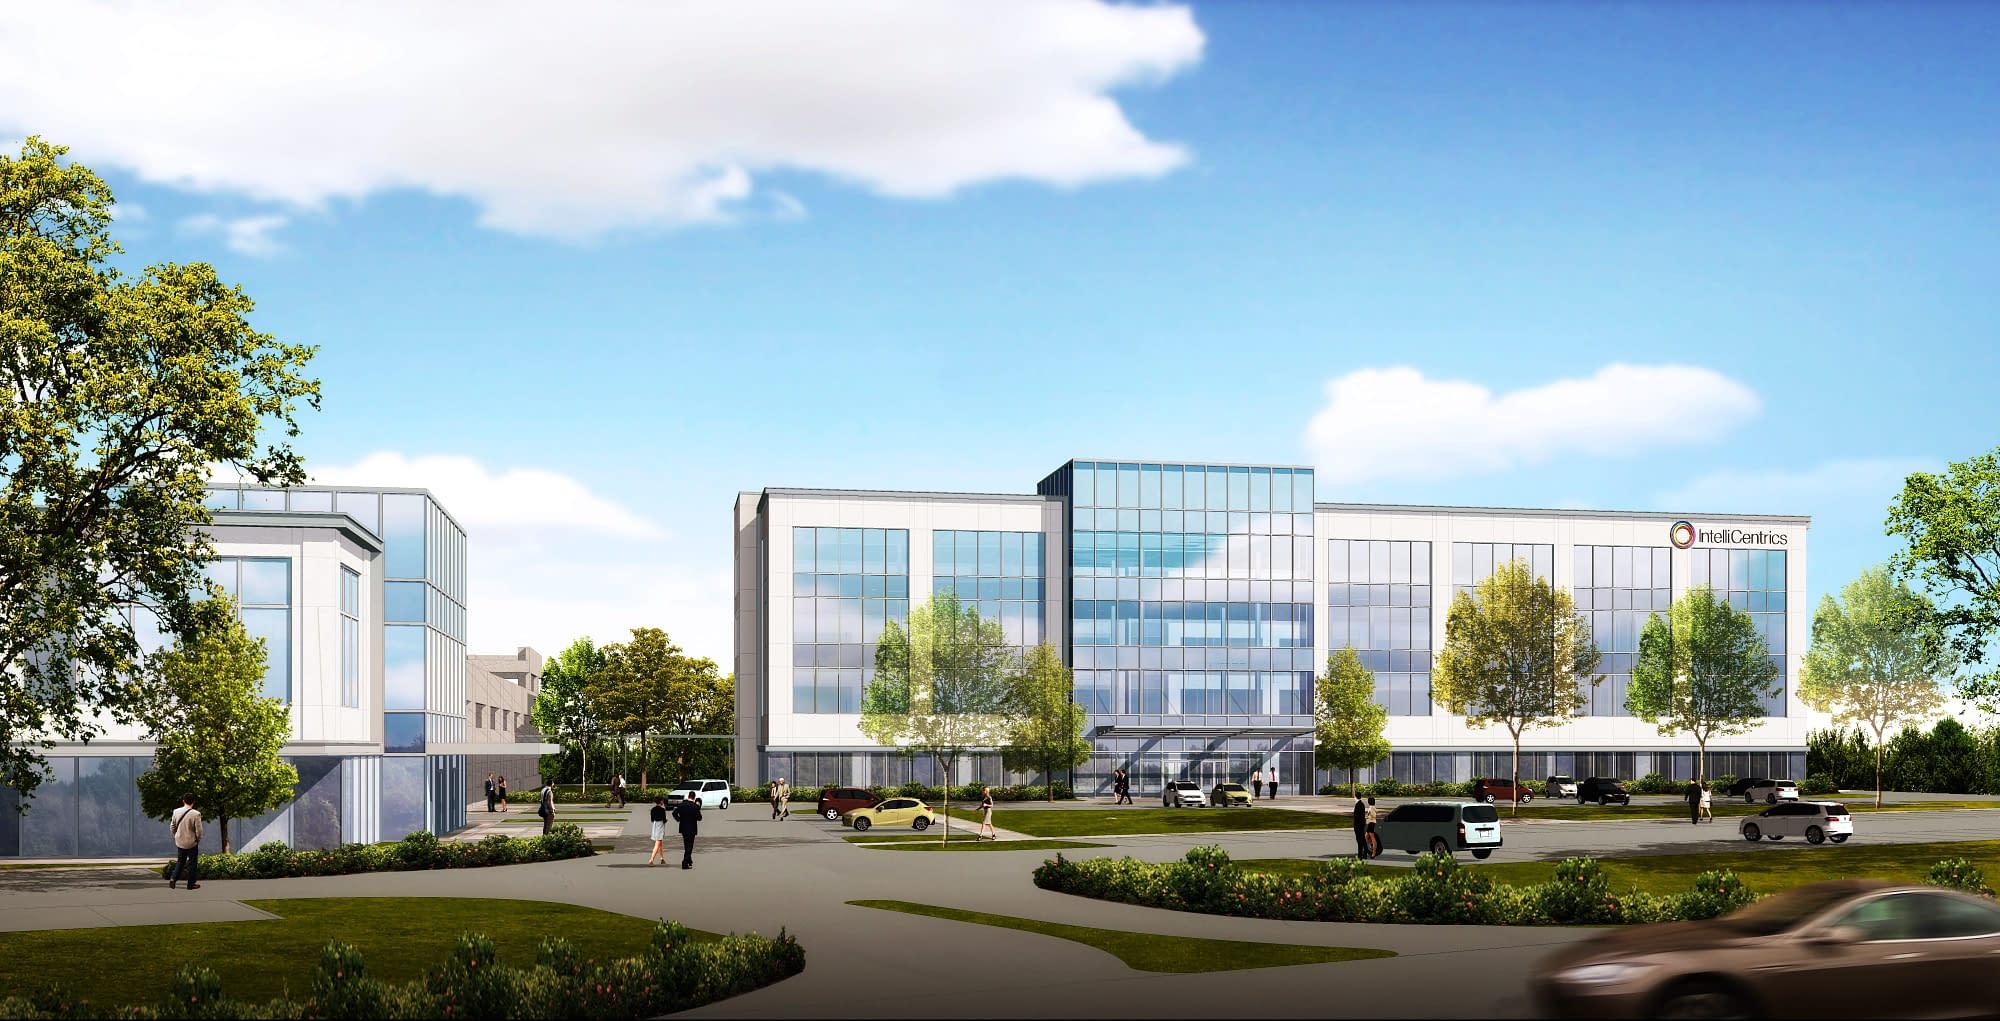 IntelliCentrics new world-wide headquarters